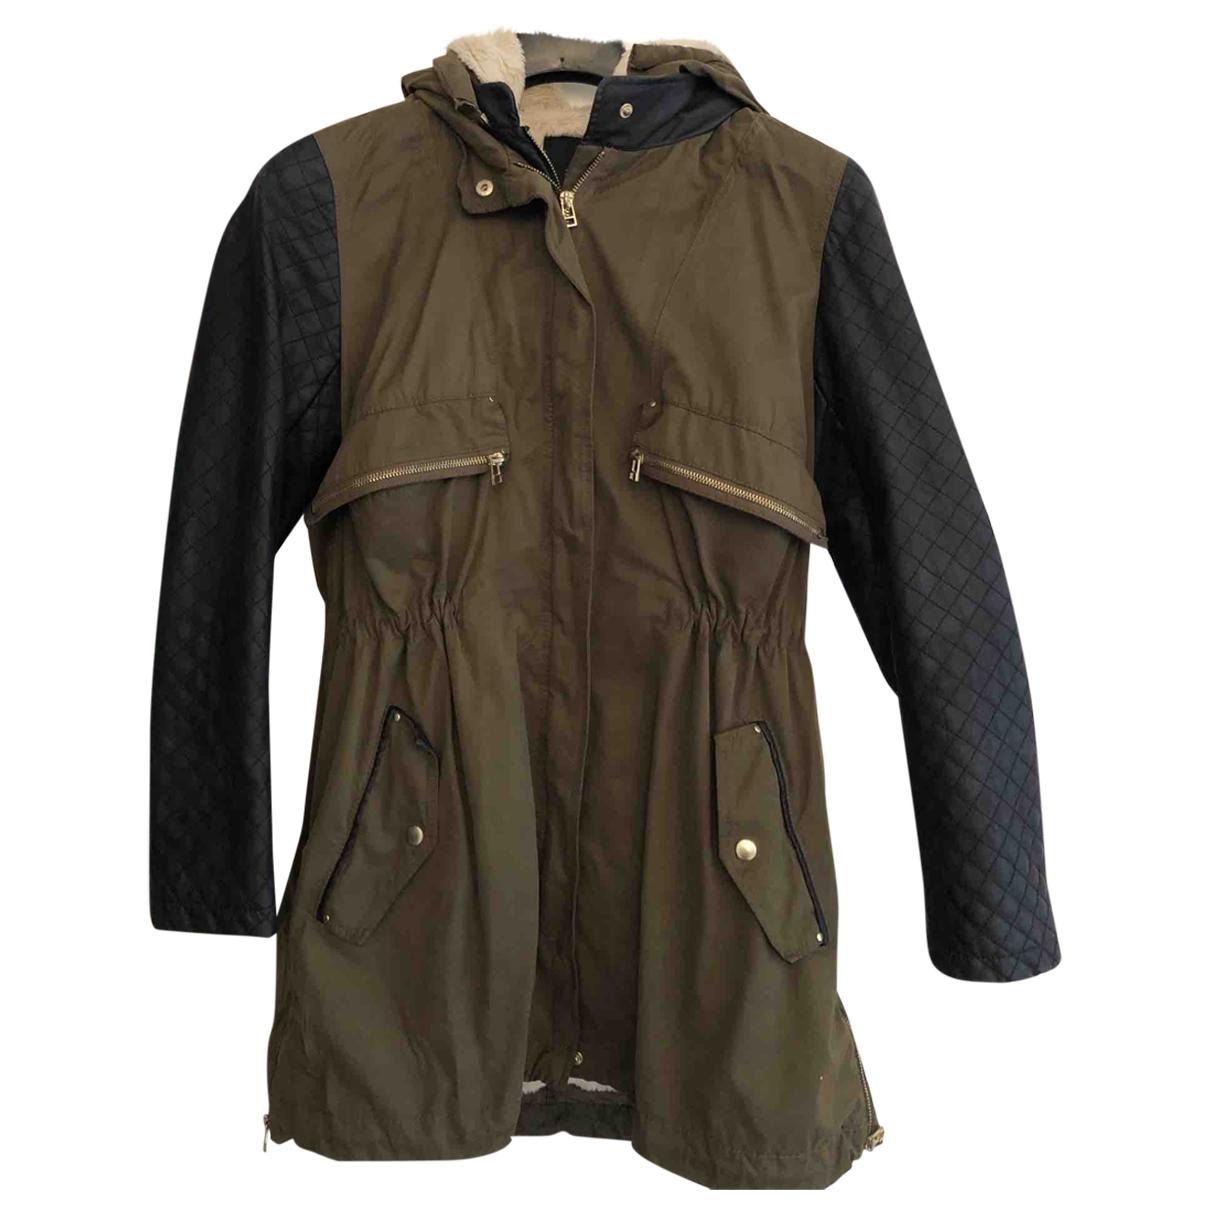 Zara \N Jacke in  Khaki Polyester